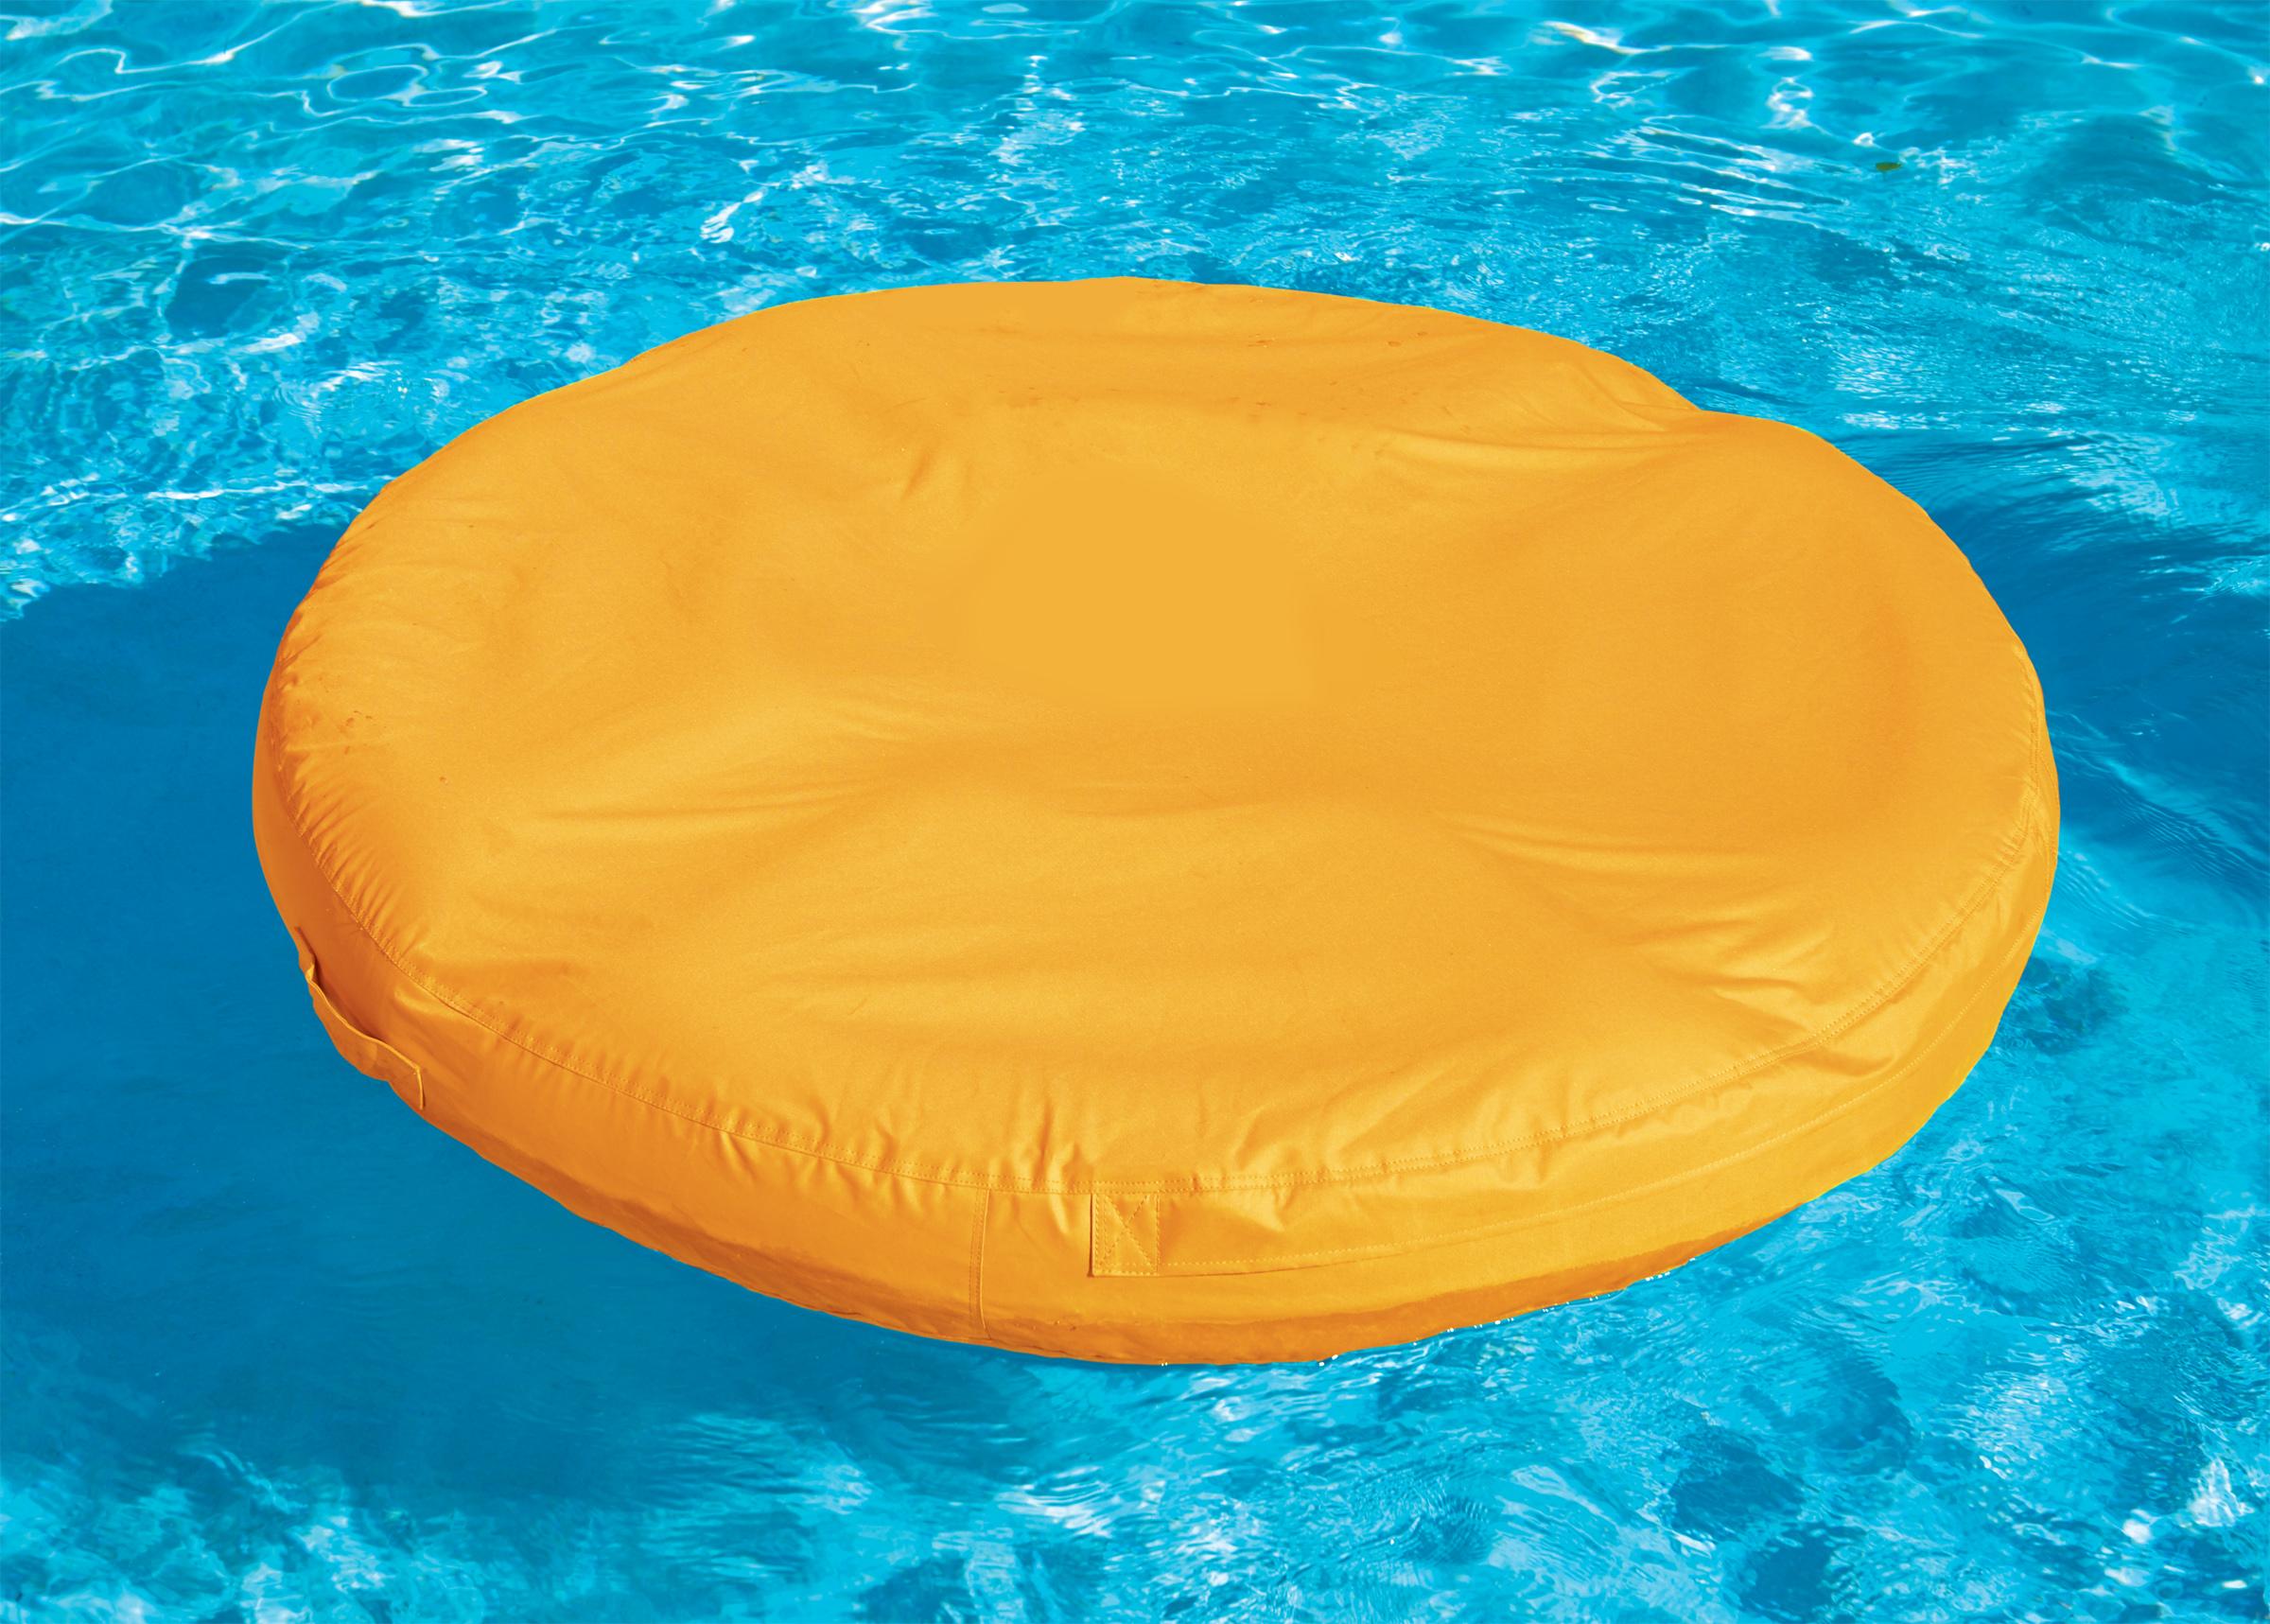 Sunsoft Island Bean Bag Inflatable Lounger For Swimming Pool Orange